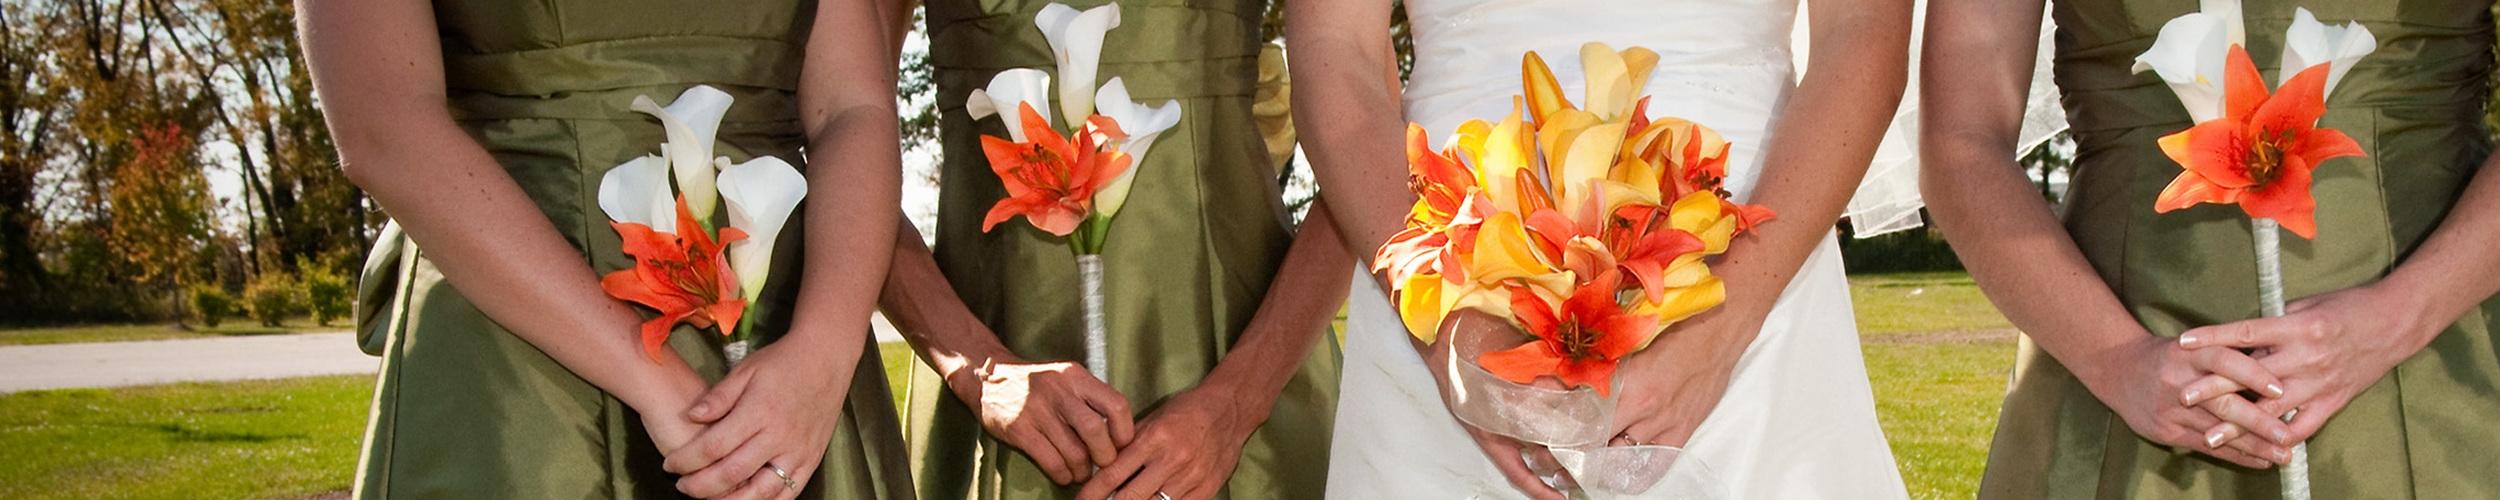 minneapolis-silk-florist-wedding-flower-bridal-bouquet.jpg